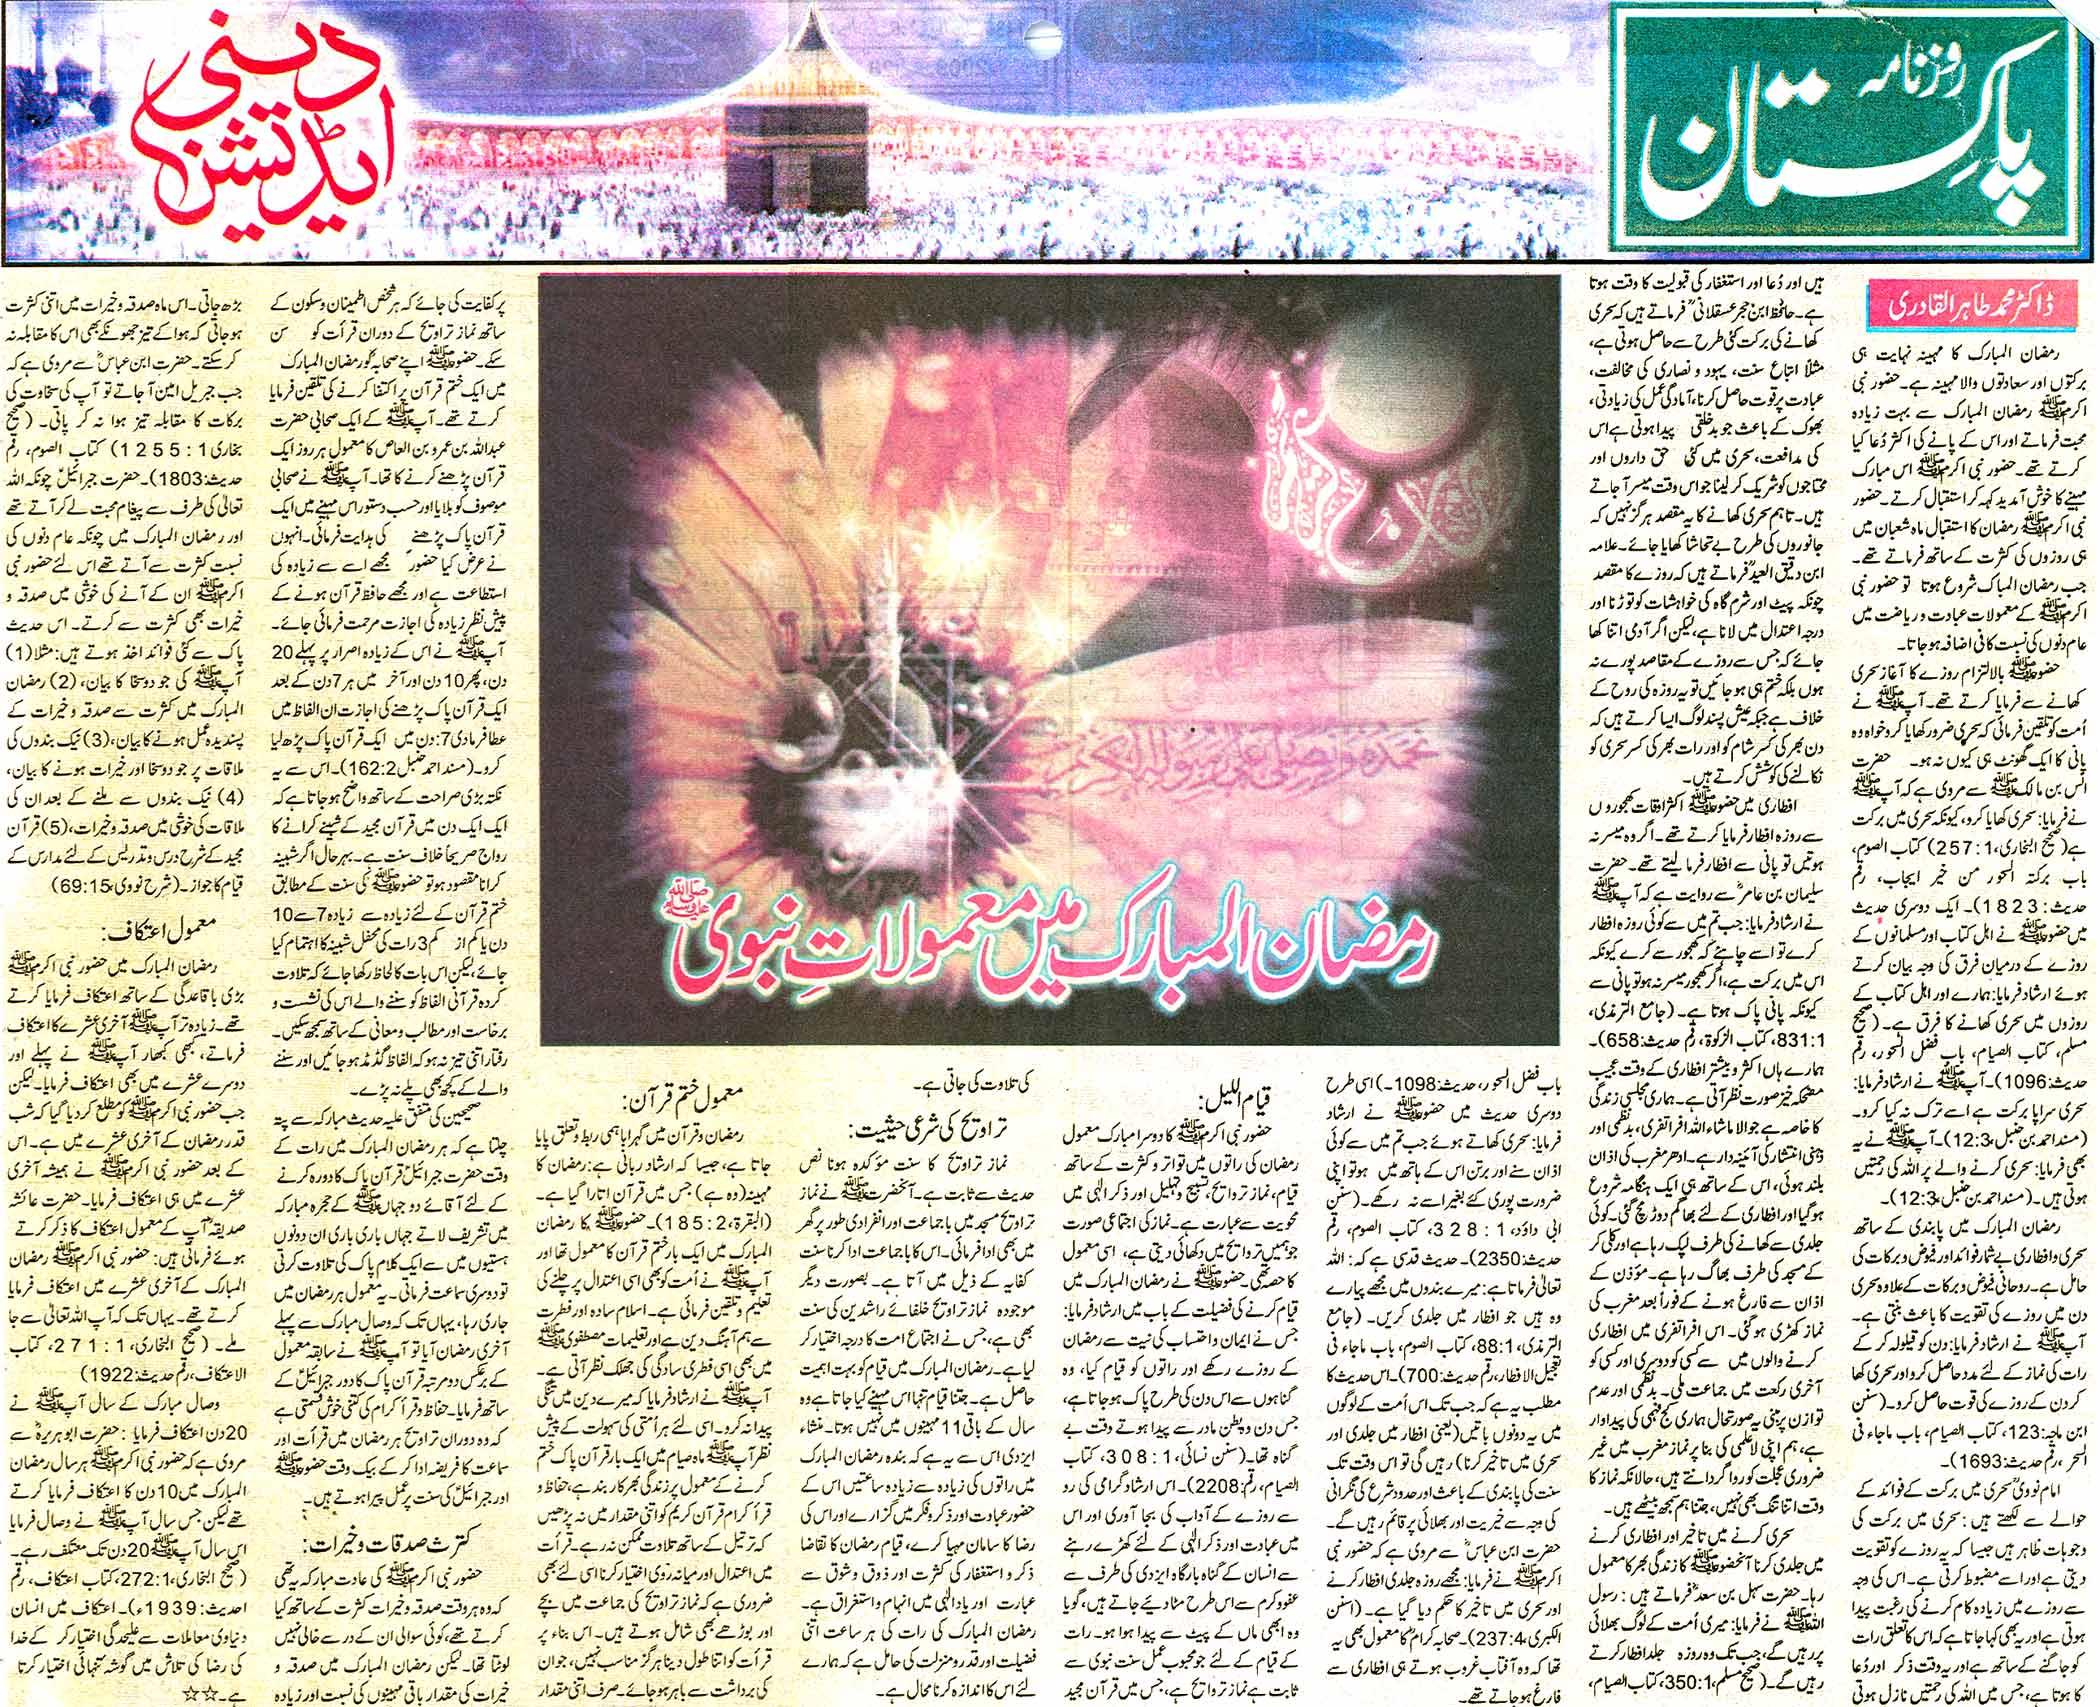 تحریک منہاج القرآن Minhaj-ul-Quran  Print Media Coverage پرنٹ میڈیا کوریج Daily Pakistan Colour Page